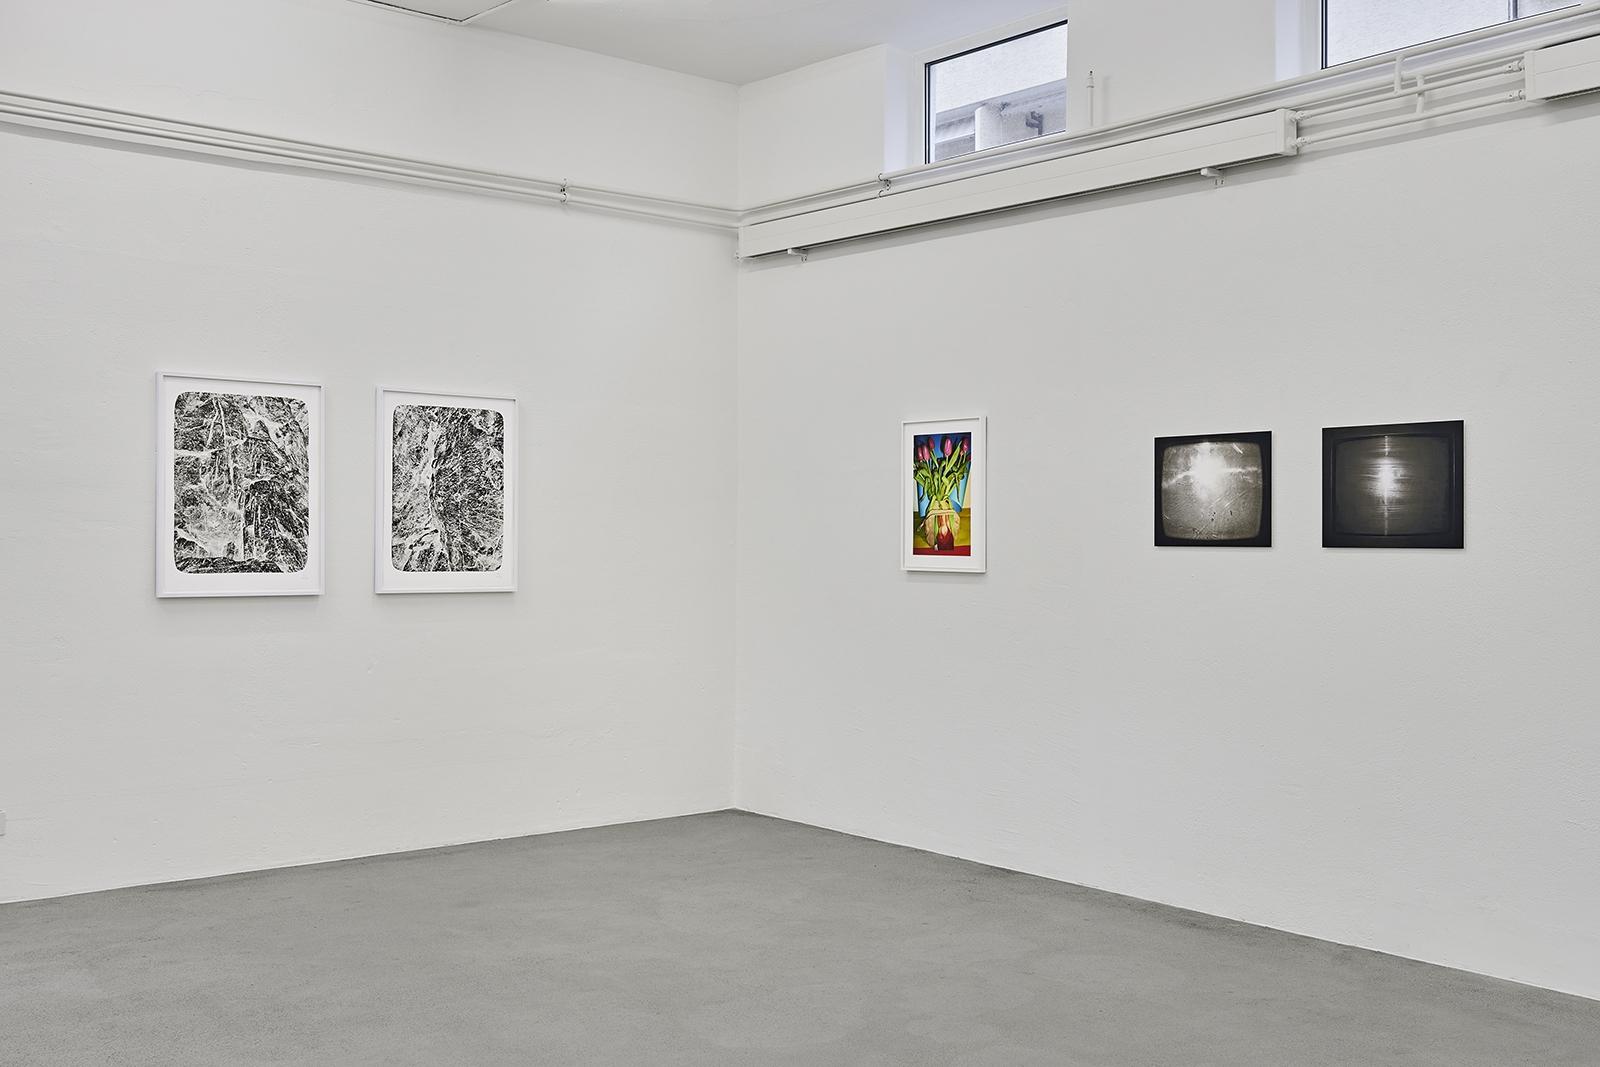 Ausstellungsansicht Guido Baselgia, Walter Pfeiffer, Daniela Comani